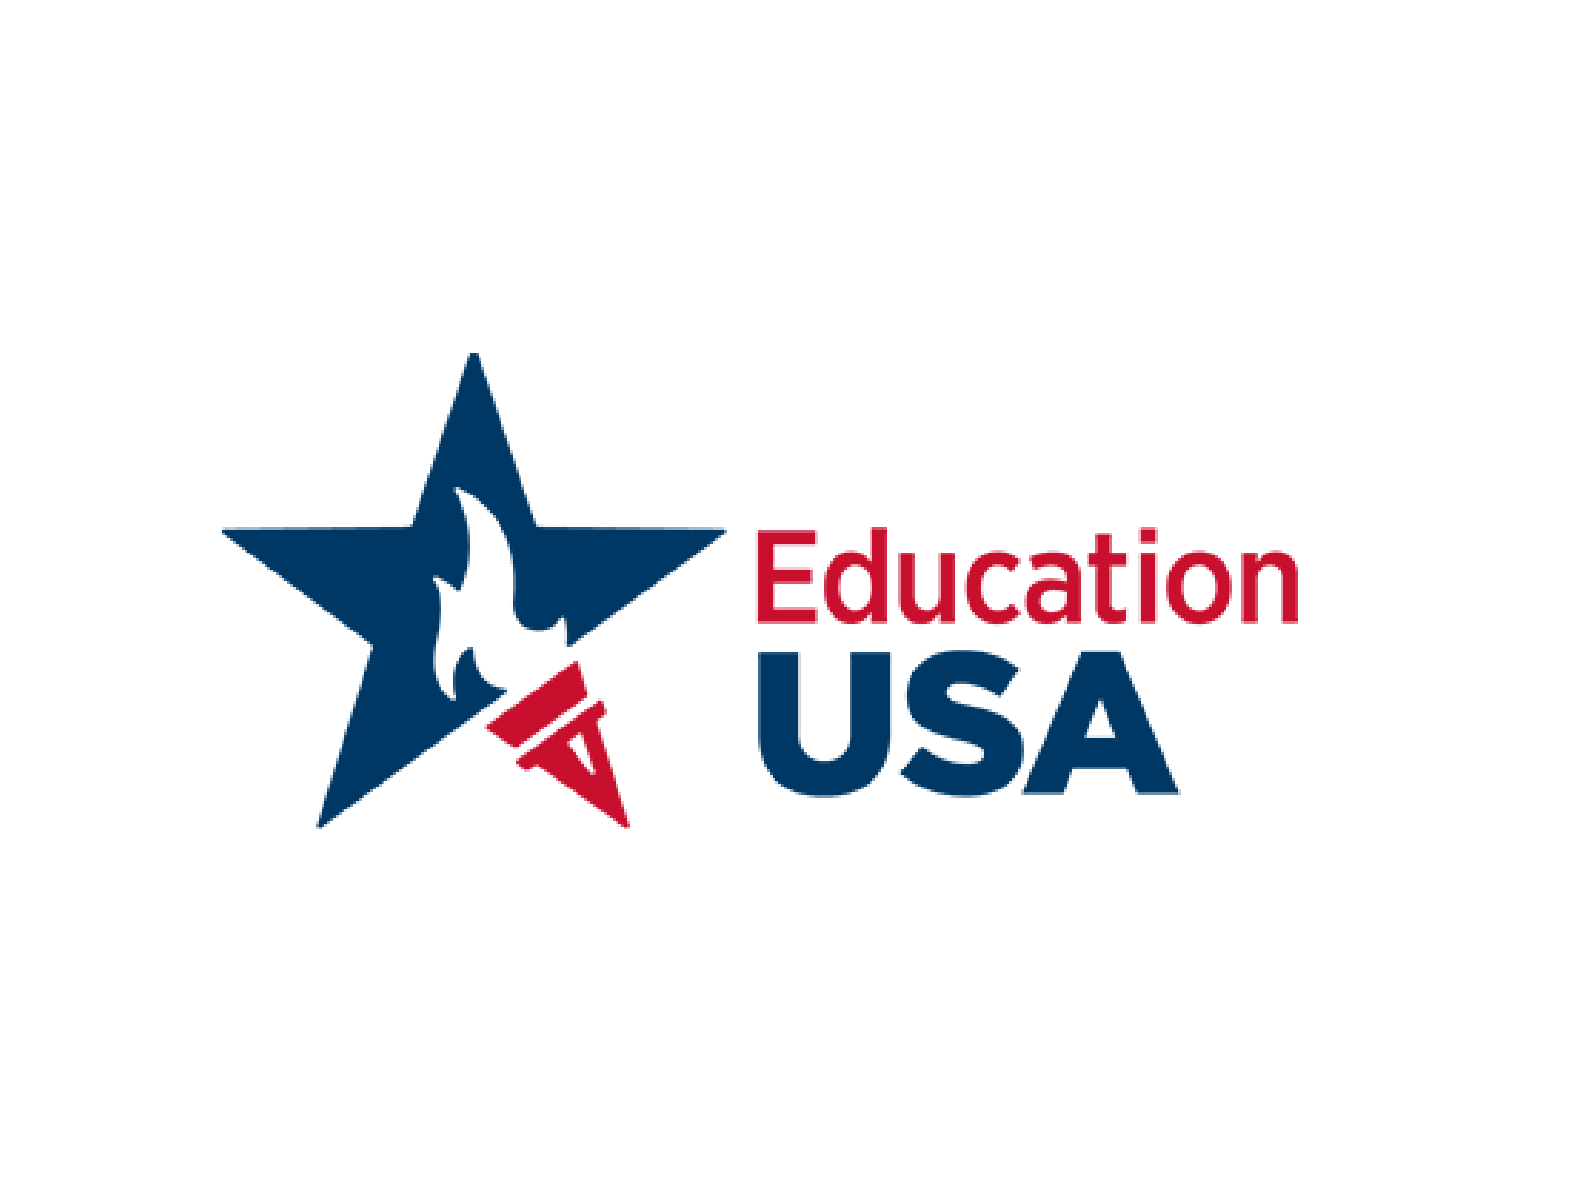 Education USA